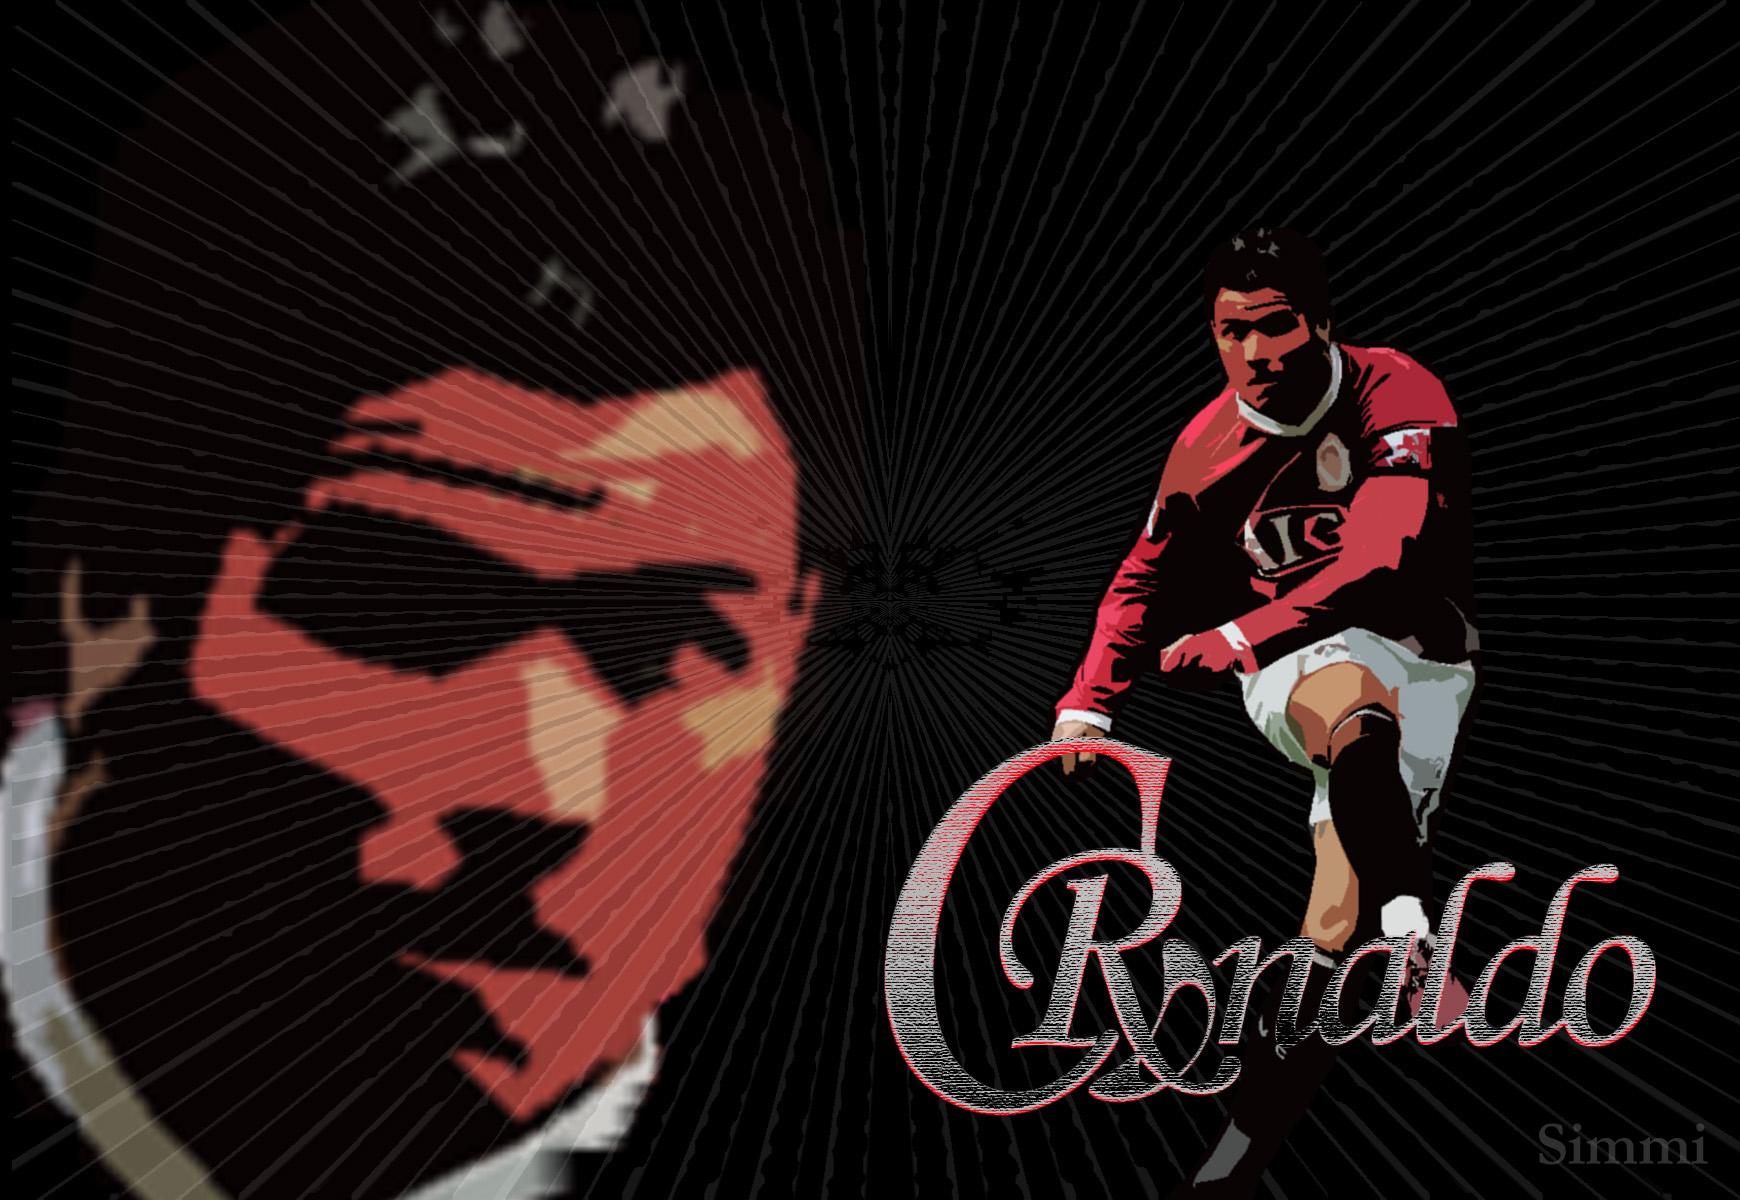 Cristiano Ronaldo Wallpapers  Photos  Images  Cristiano Ronaldo